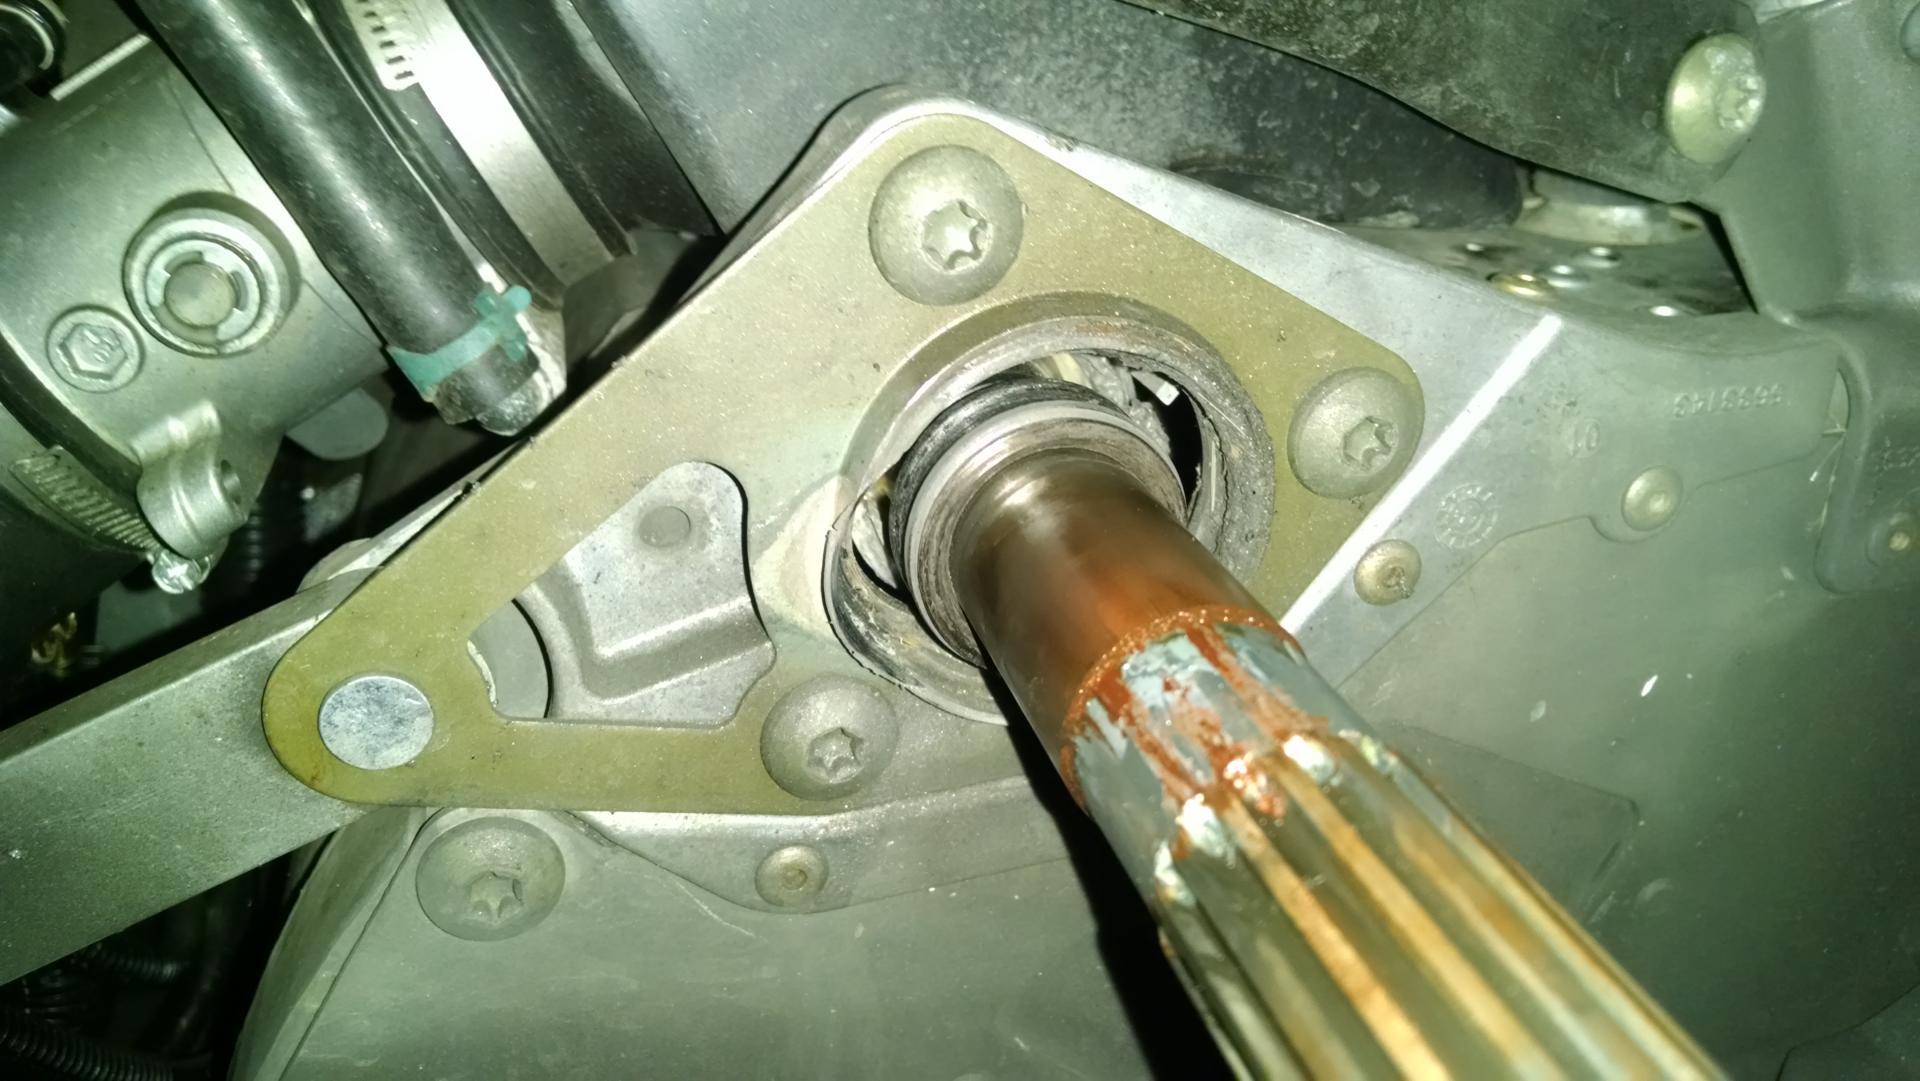 Jack shaft bearing failure  - HCS Snowmobile Forums